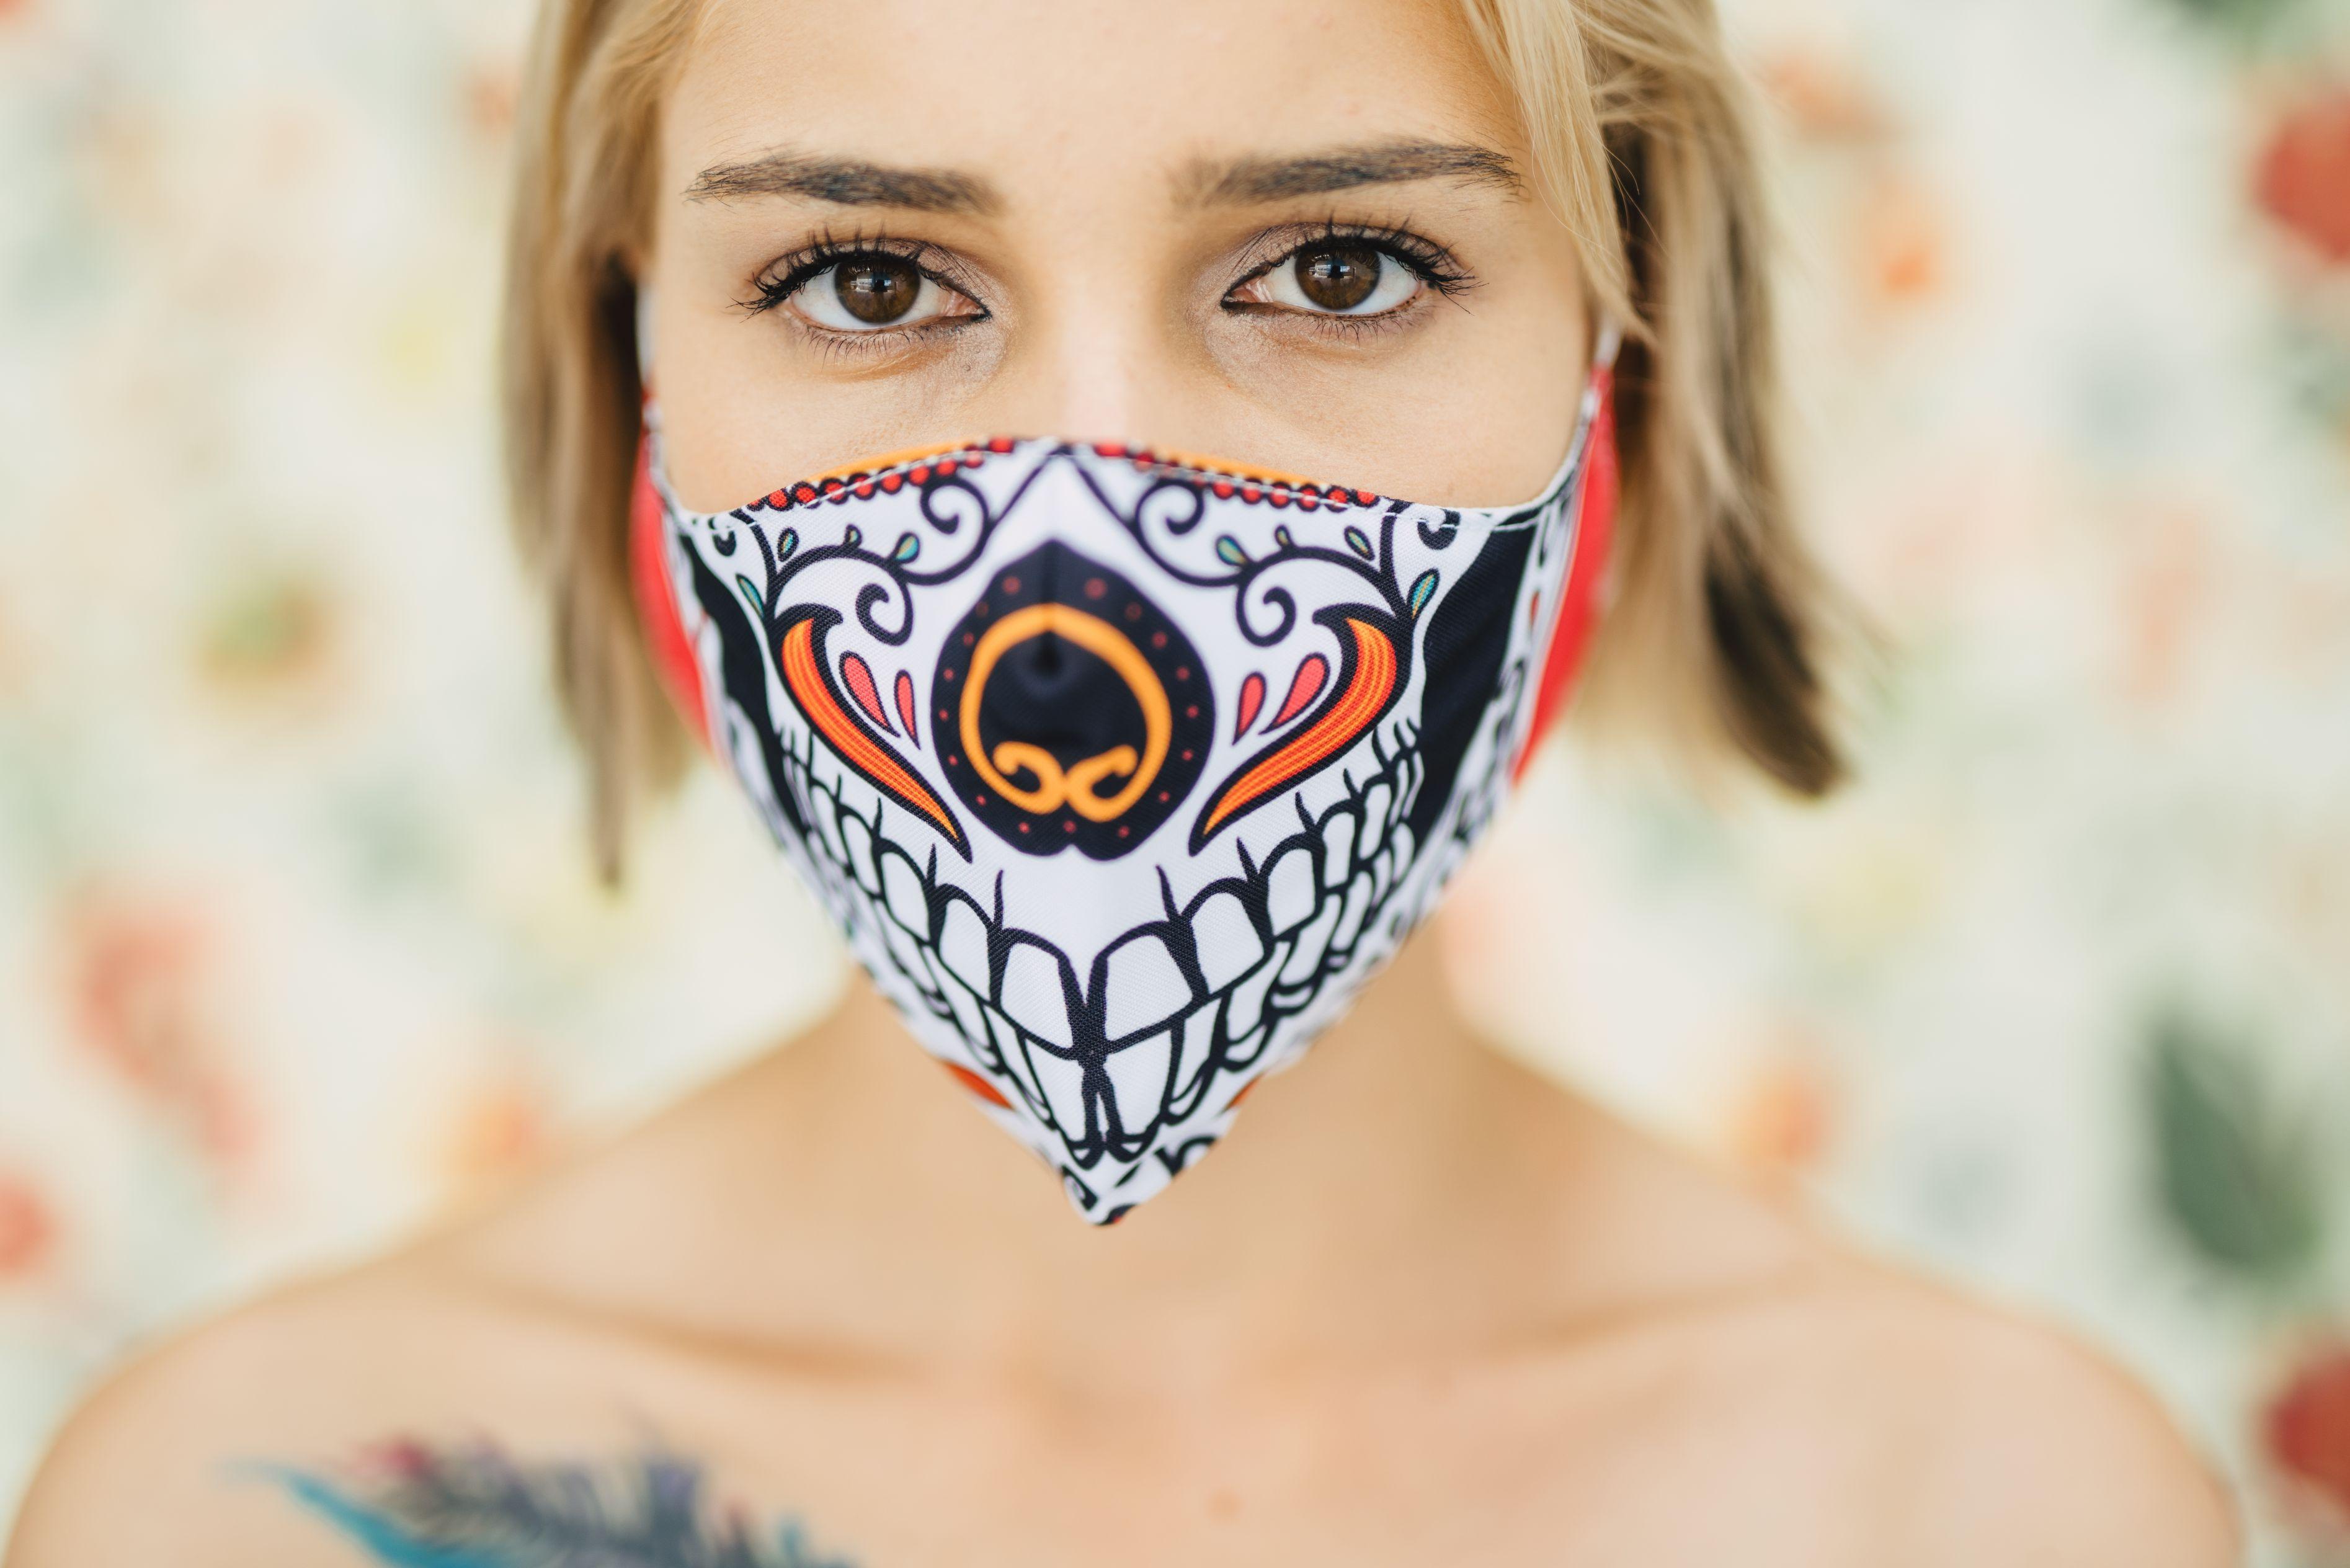 Mască Dia de los muertos - 29 LEI |  PRINTCENTER - Tipar digital, offset, indoor, outdoor